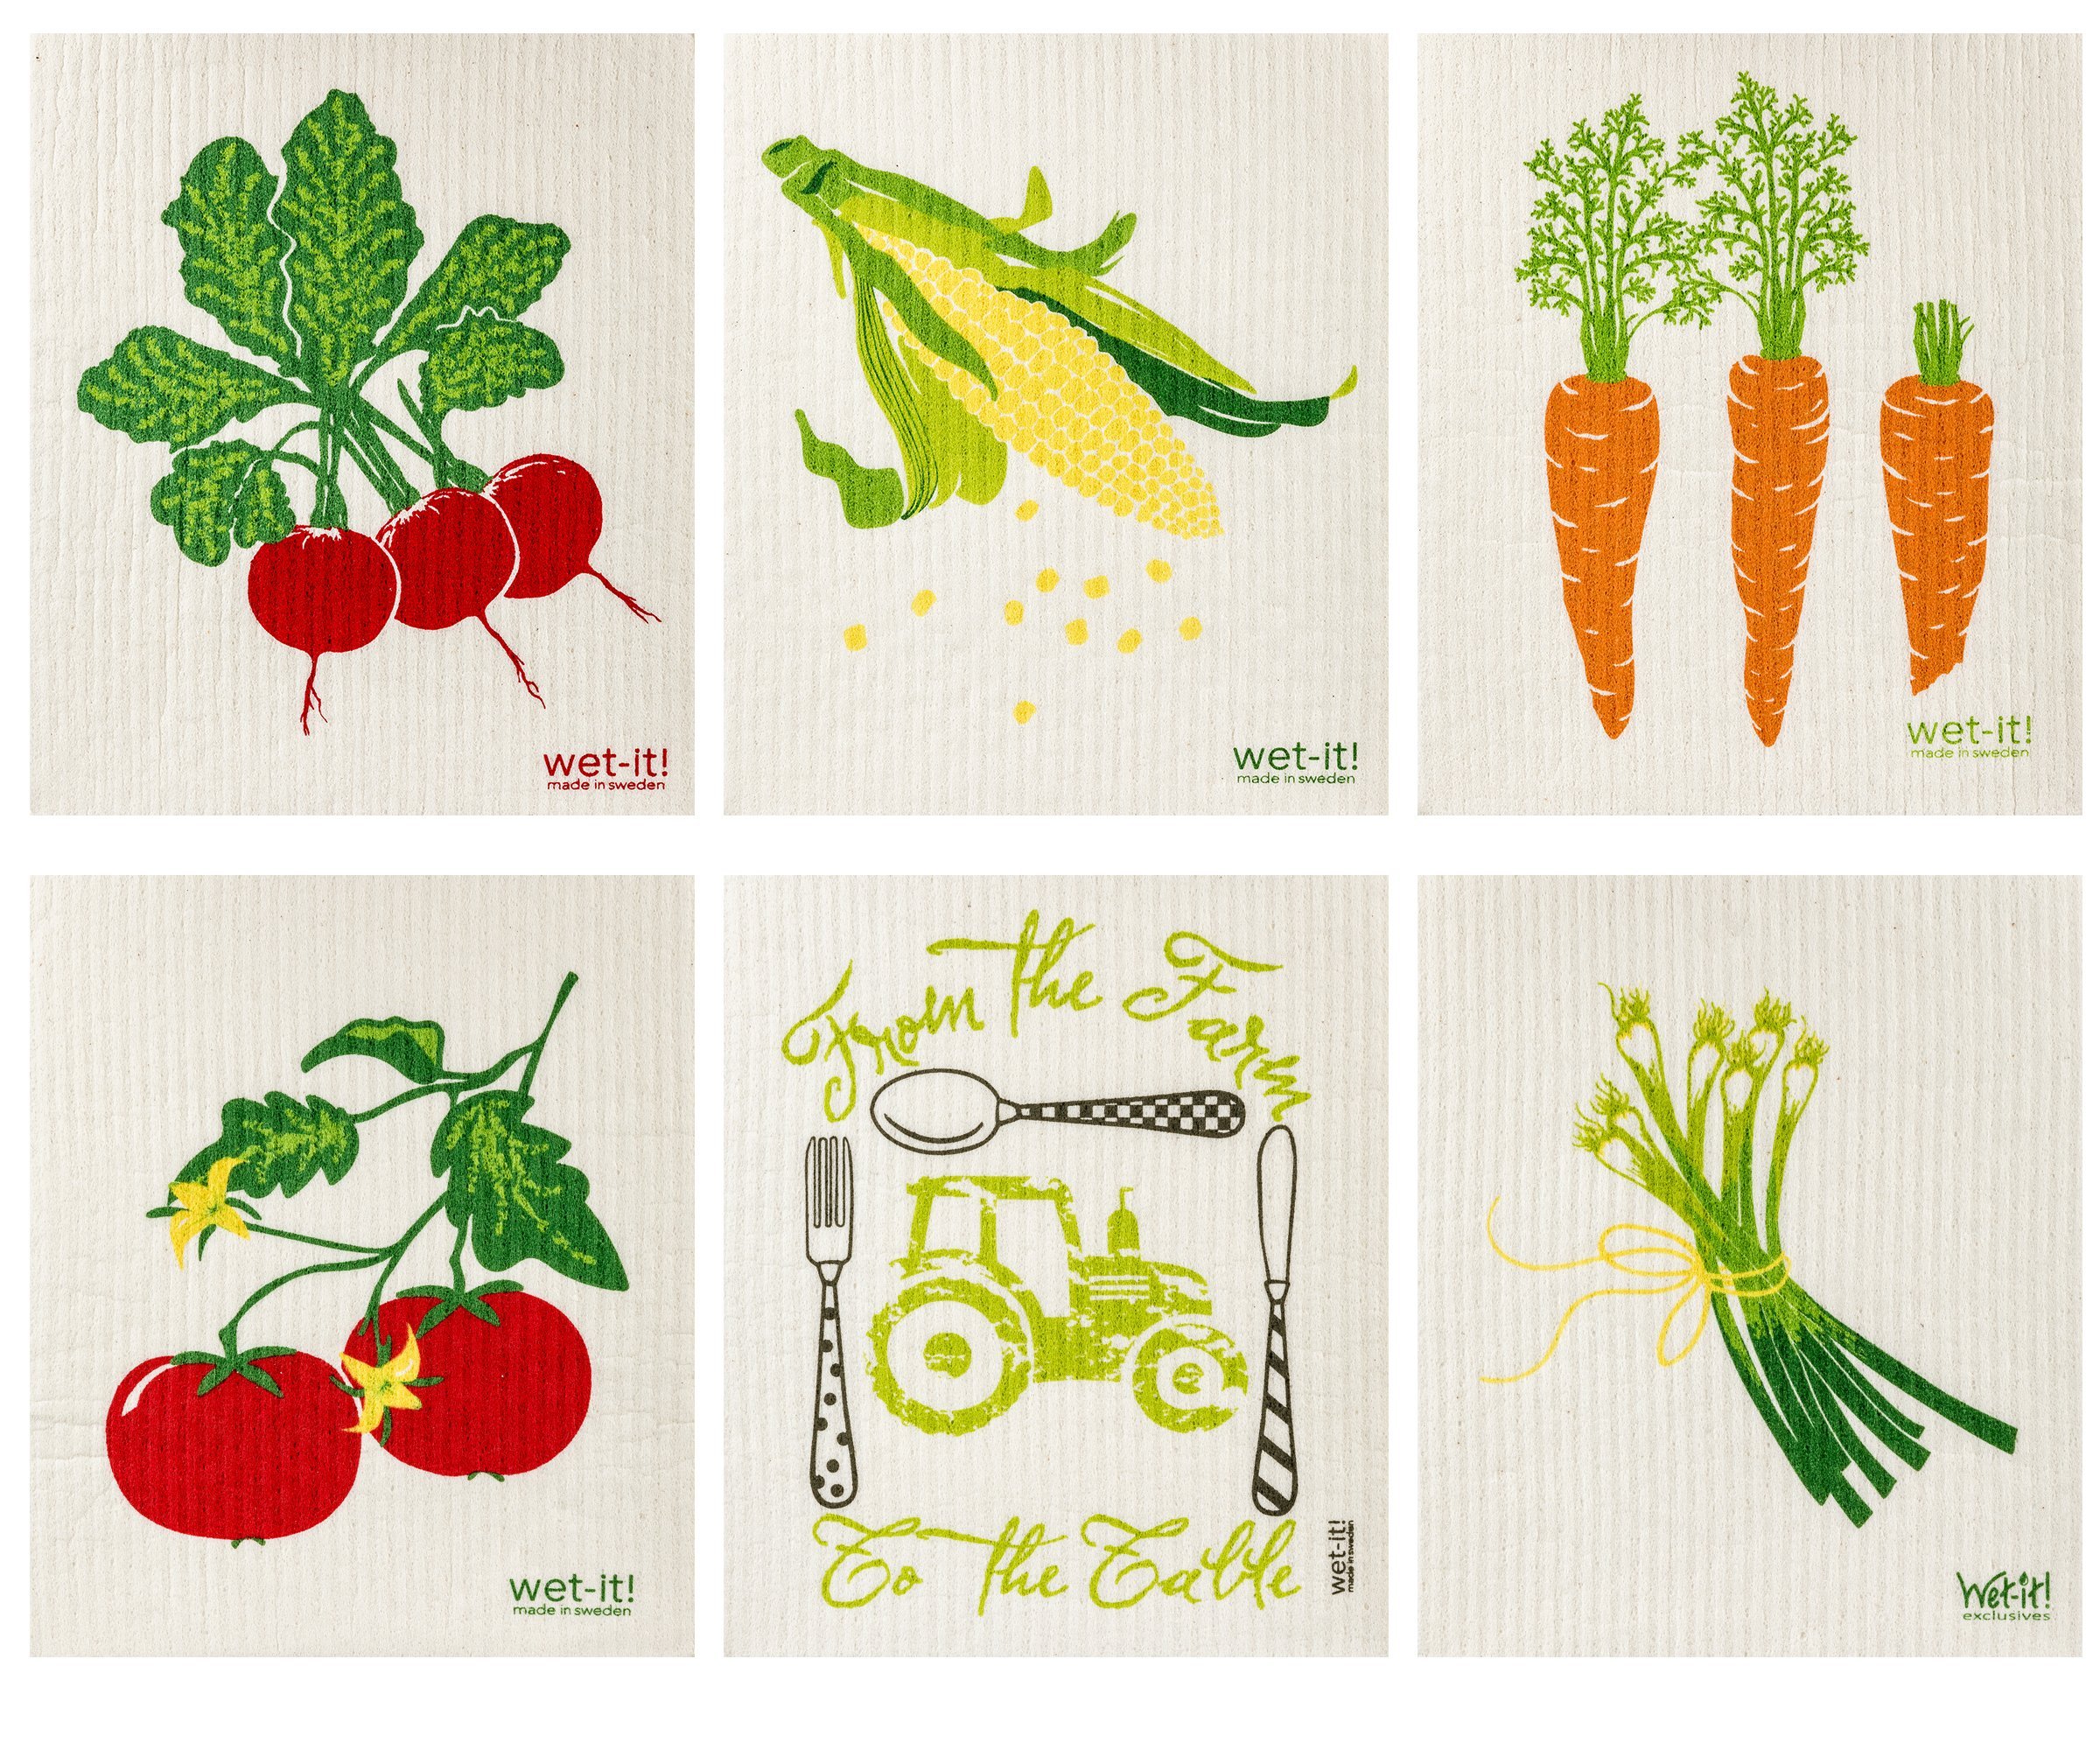 Wet-It Swedish Dishcloth Set of 6 (Tractor, Tomato, Corn, Raddishes, Onions, Carrots - Farm to Table)